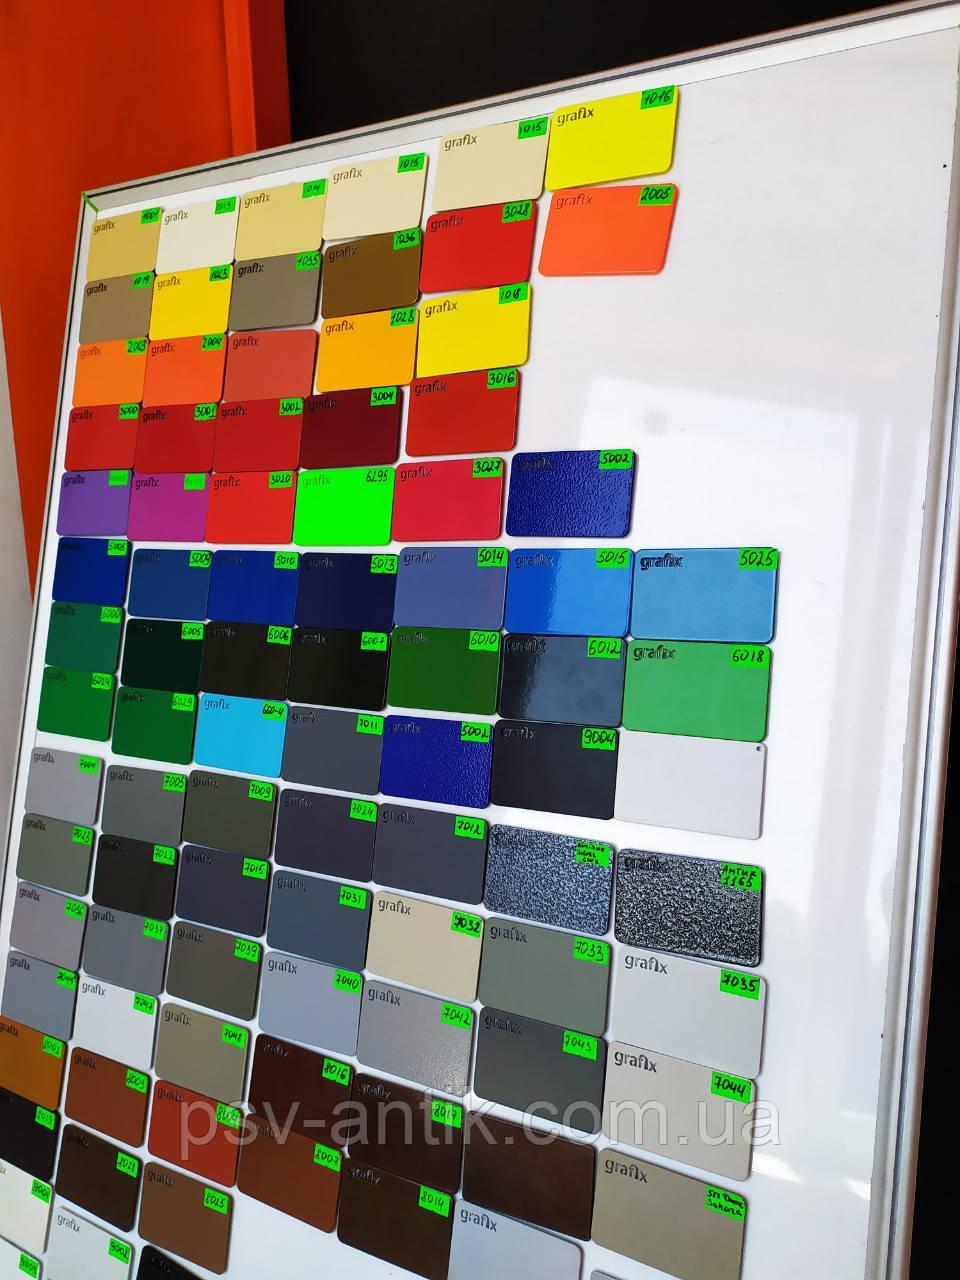 Порошковая краска глянцевая, полиэфирная, архитектурная, 6019